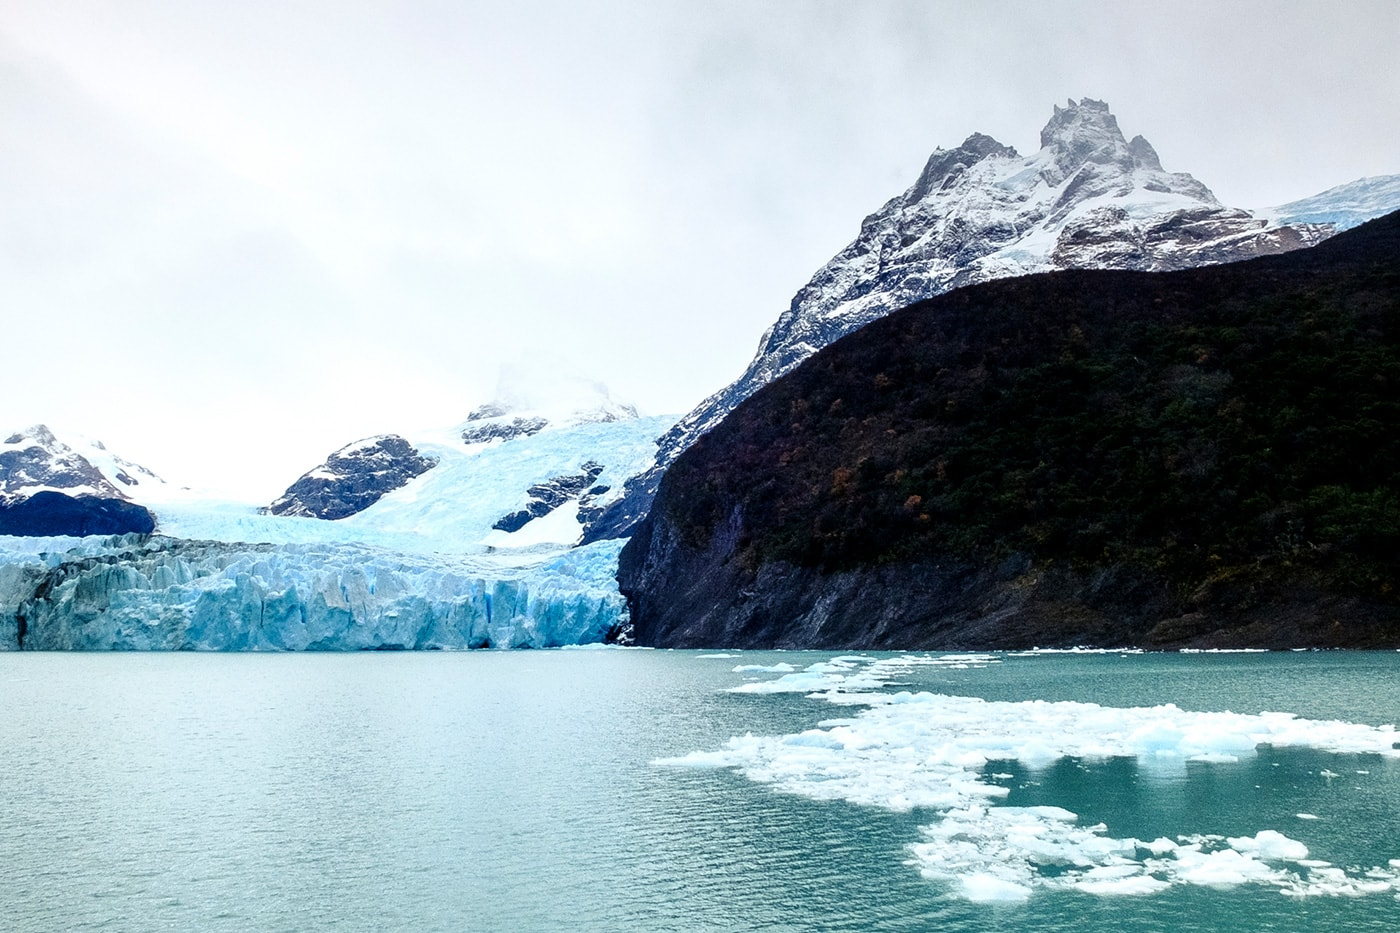 il ghiacciaio upsala